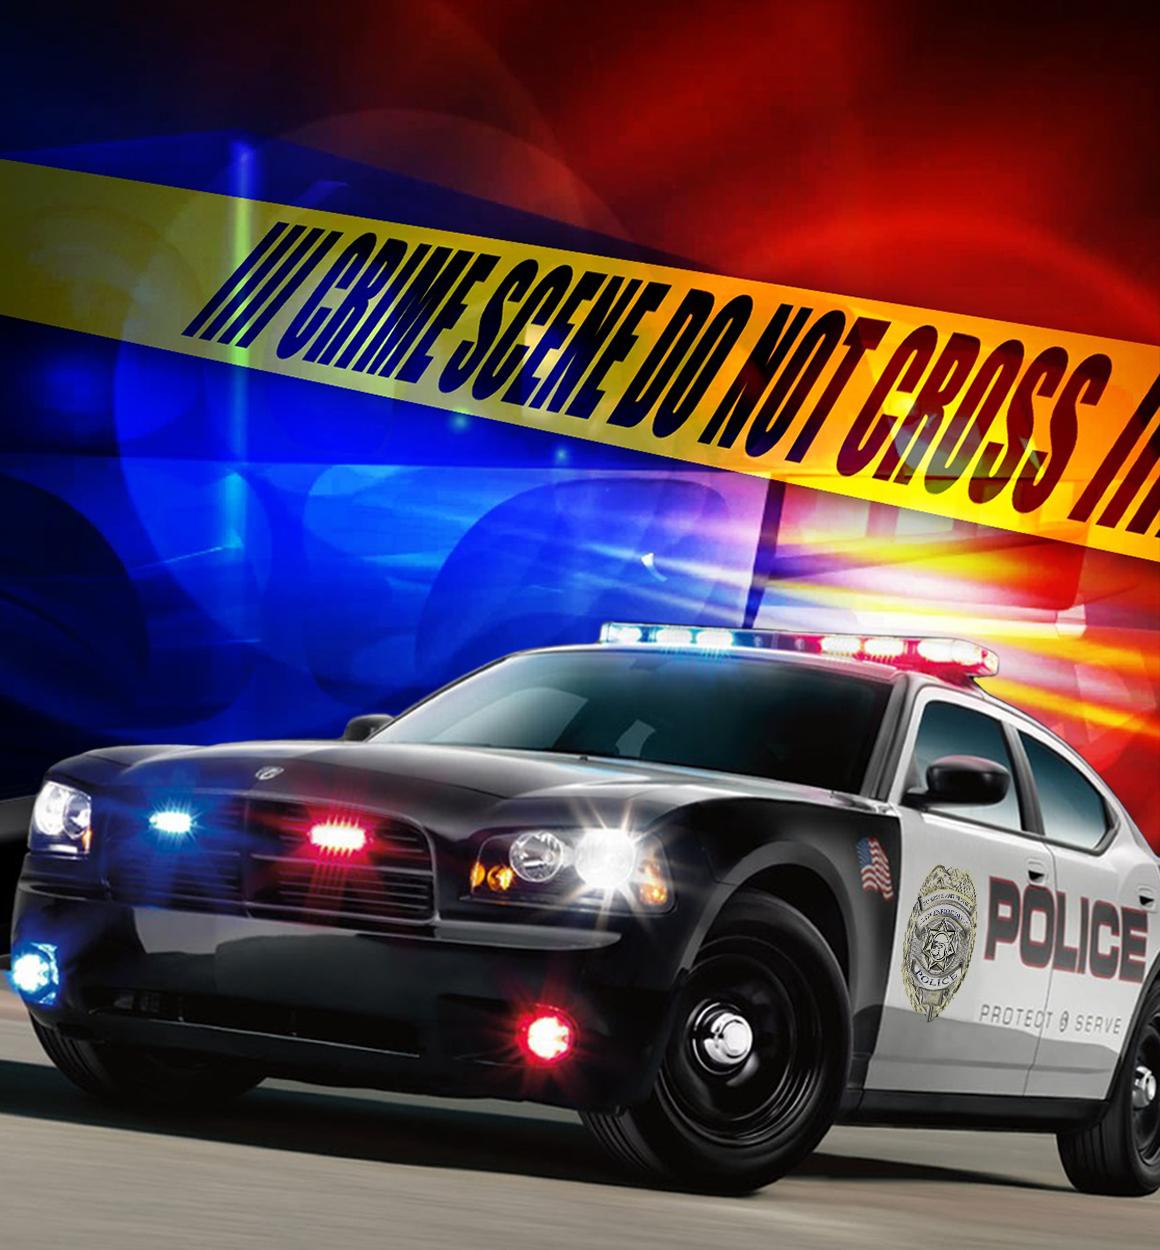 Police - Crime Tape_1546042403024.jpg.jpg